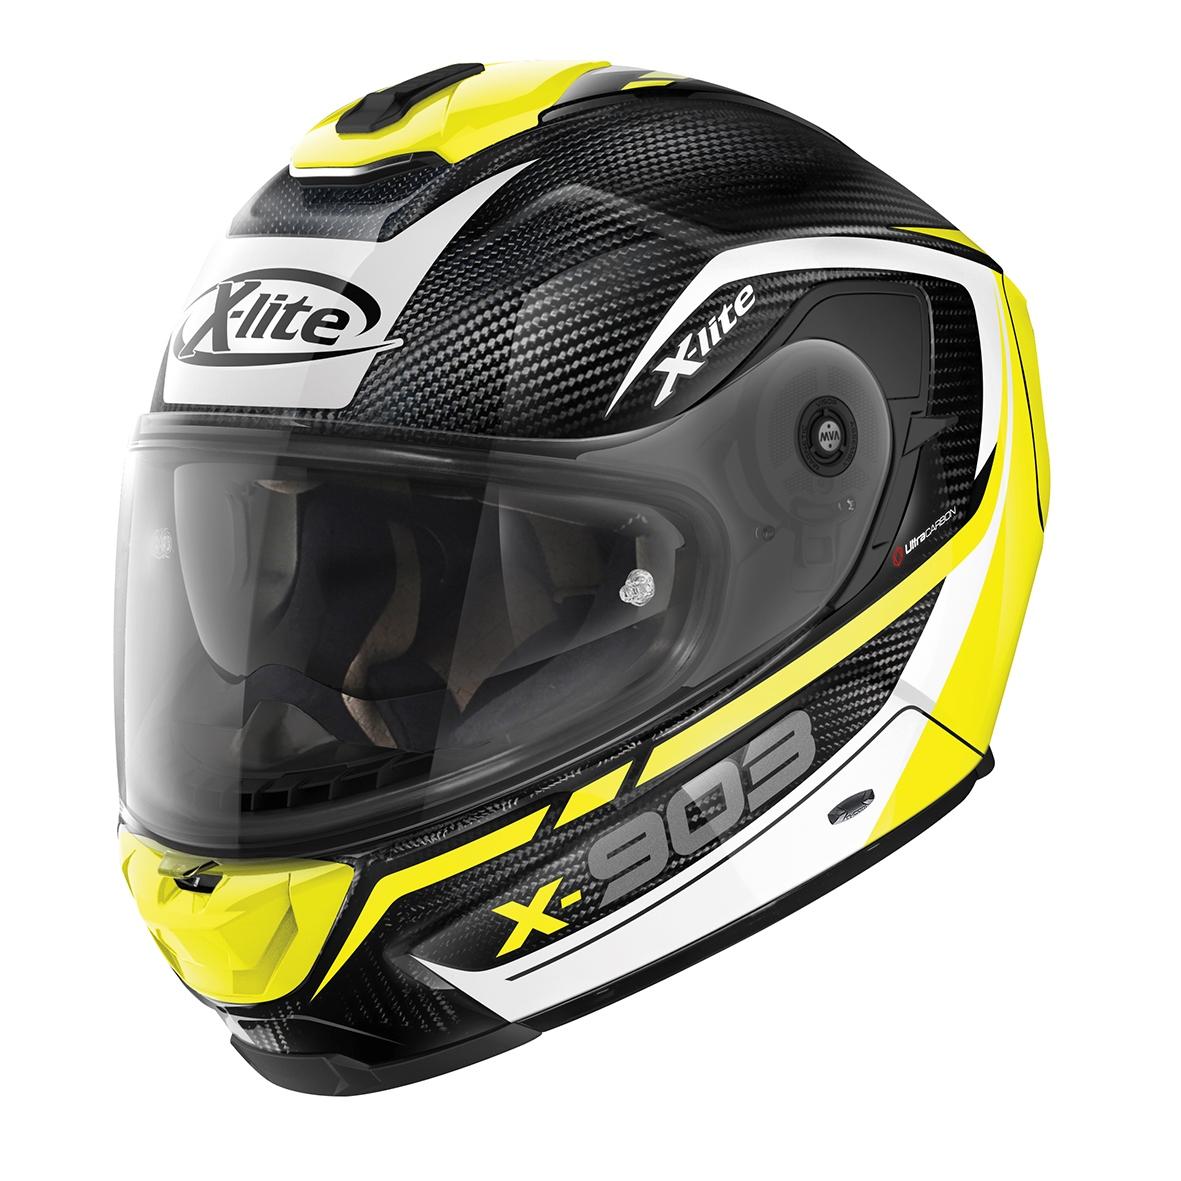 Moto helma X-Lite X-903 Ultra Carbon Cavalcade N-Com Flat Black 12